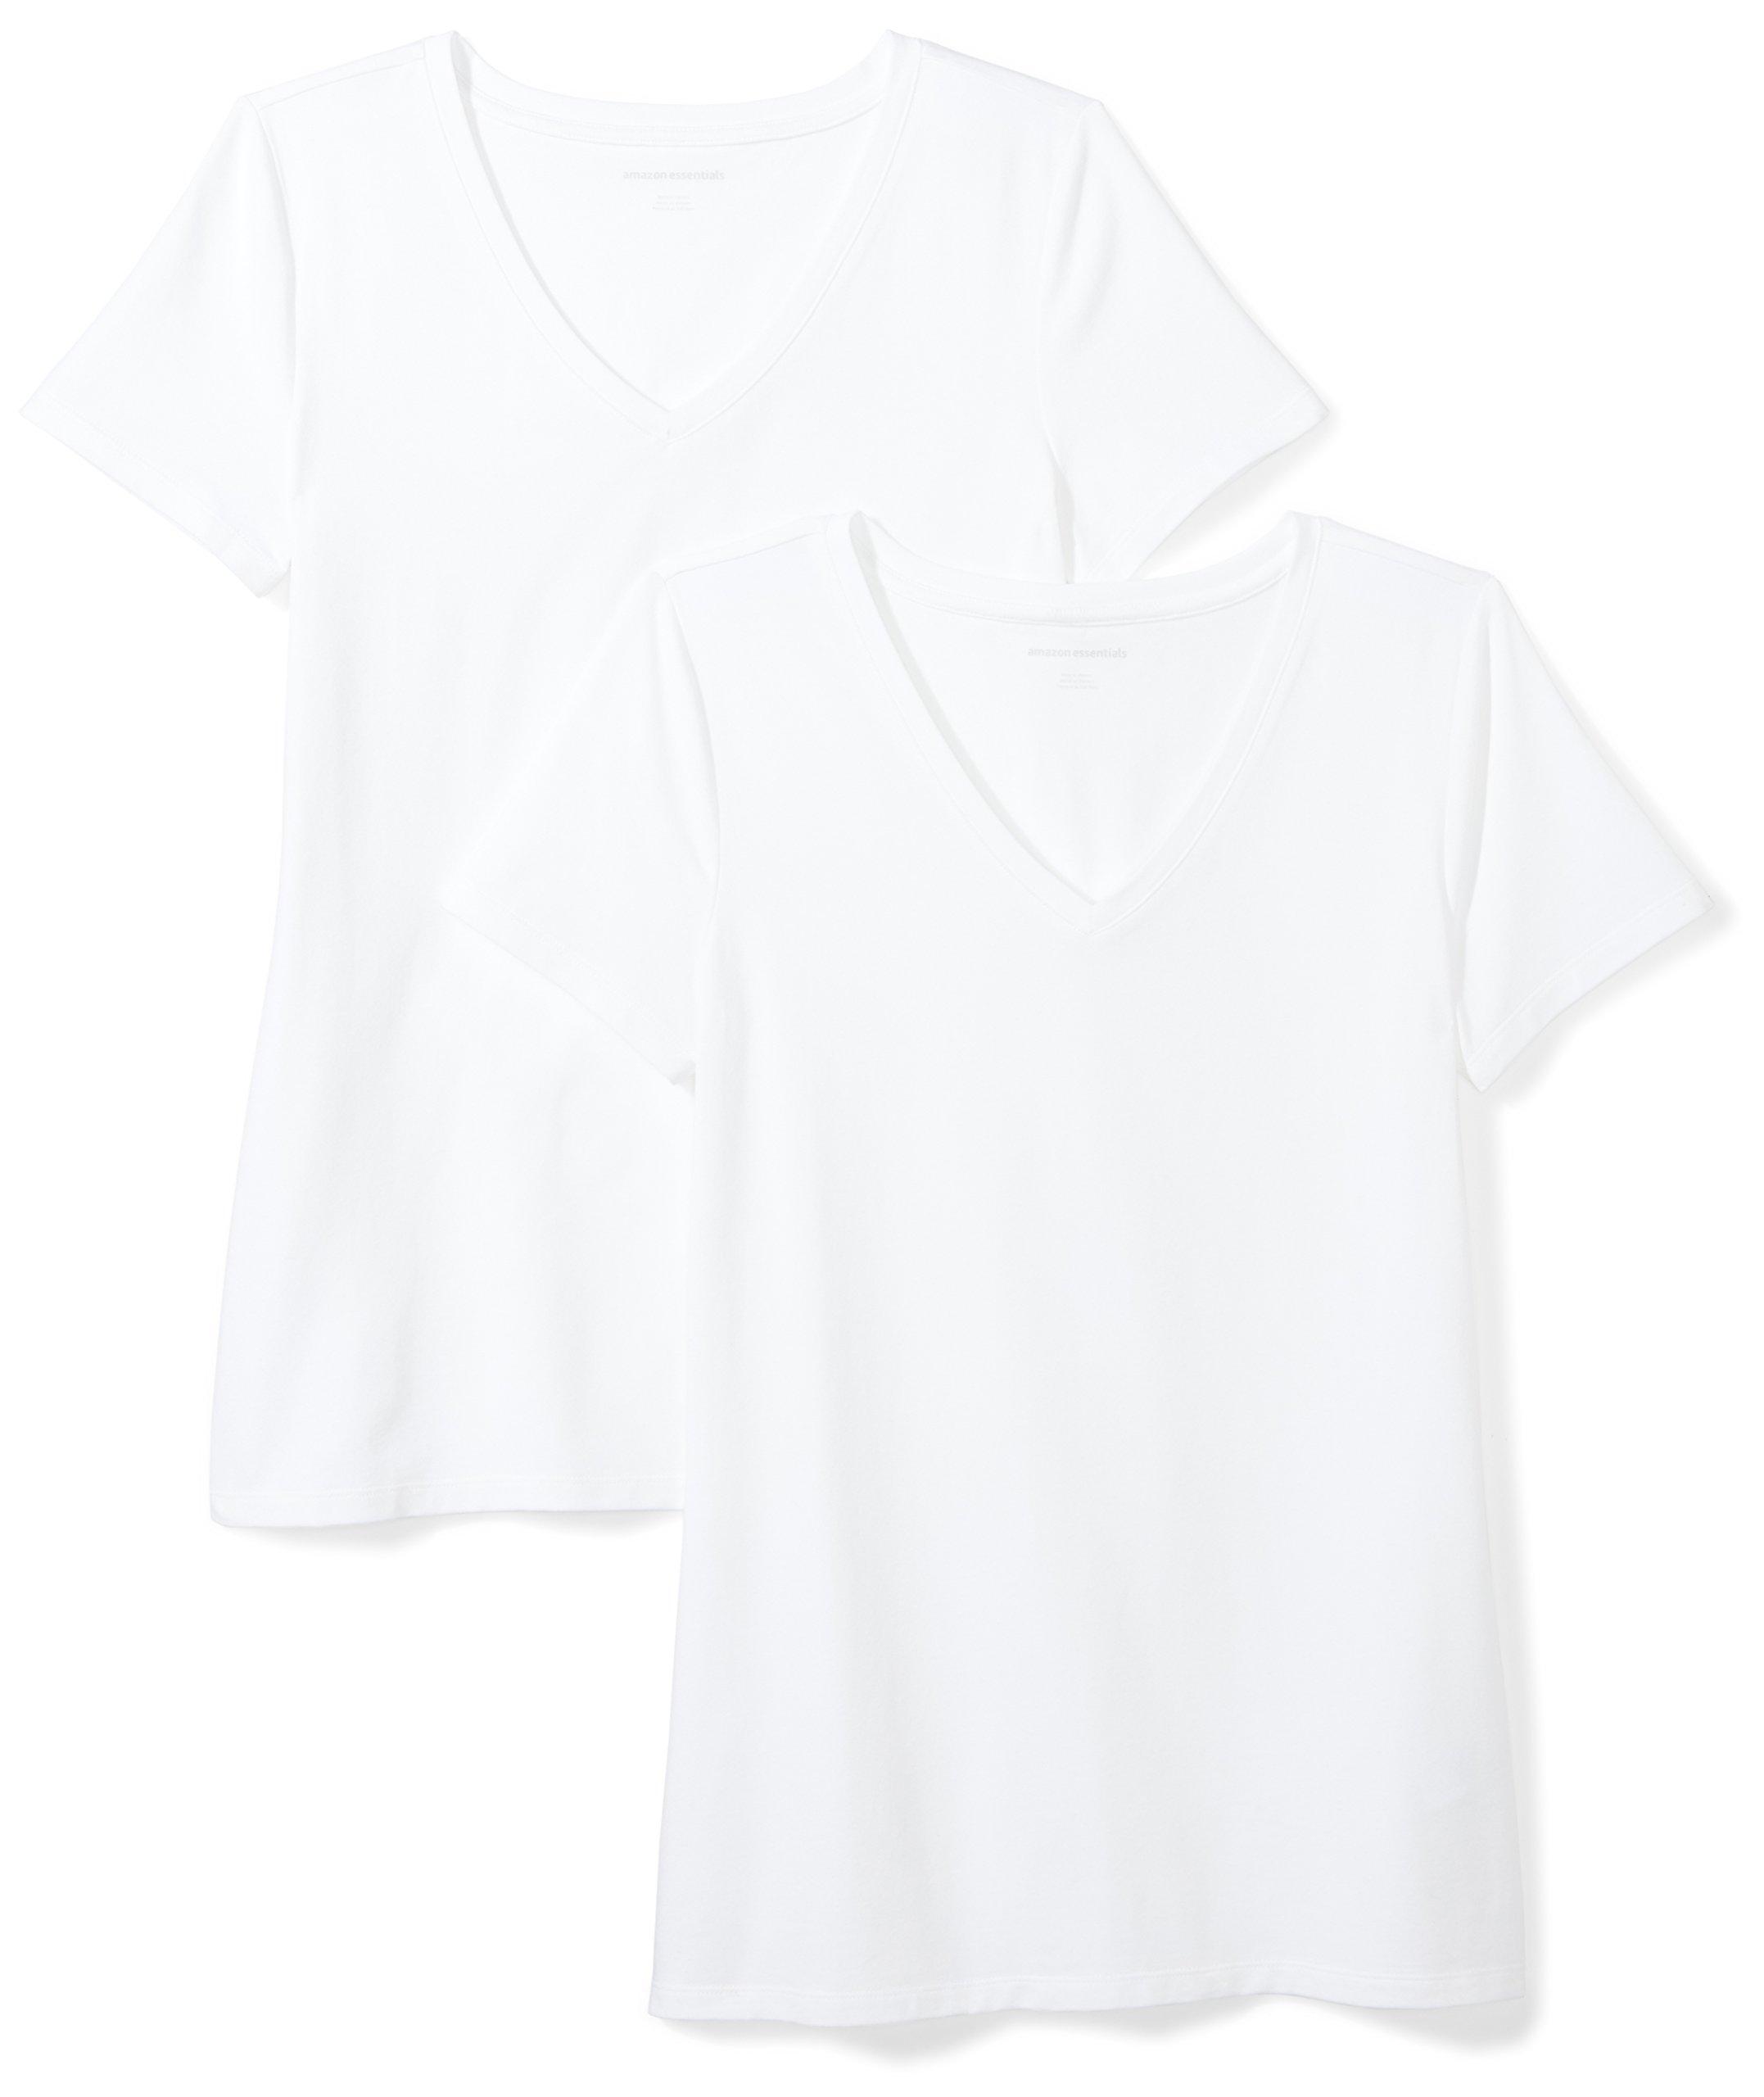 Amazon Essentials Women's 2-Pack Classic-Fit Short-Sleeve V-Neck T-Shirt, White, Medium by Amazon Essentials